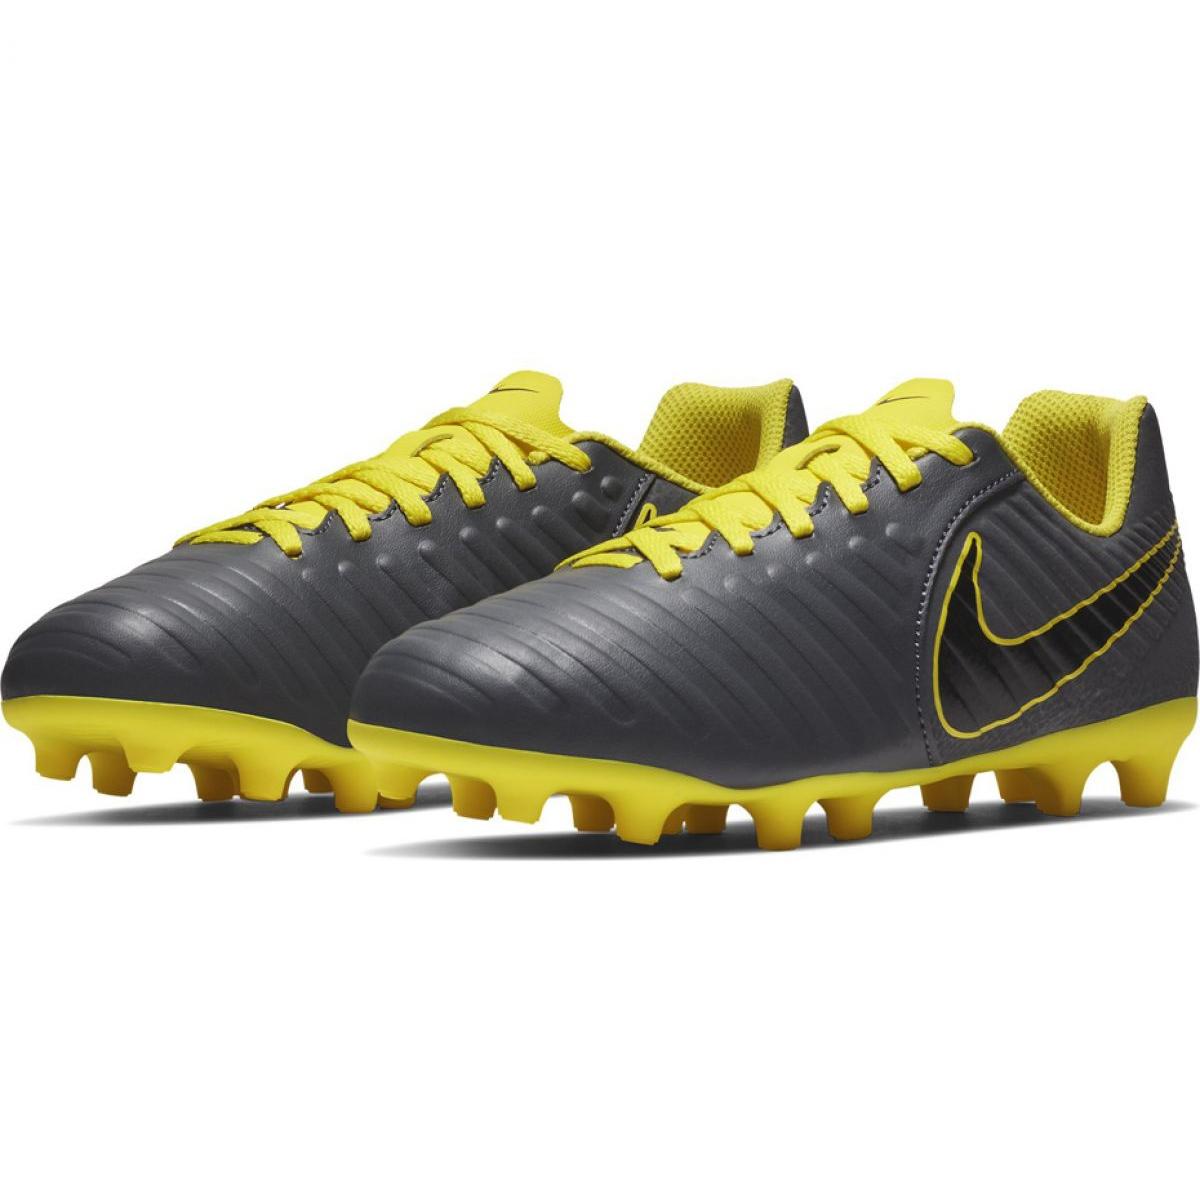 new arrivals 7c160 df837 Football shoes Nike Tiempo Legend 7 Club Mg Jr AO2300-070